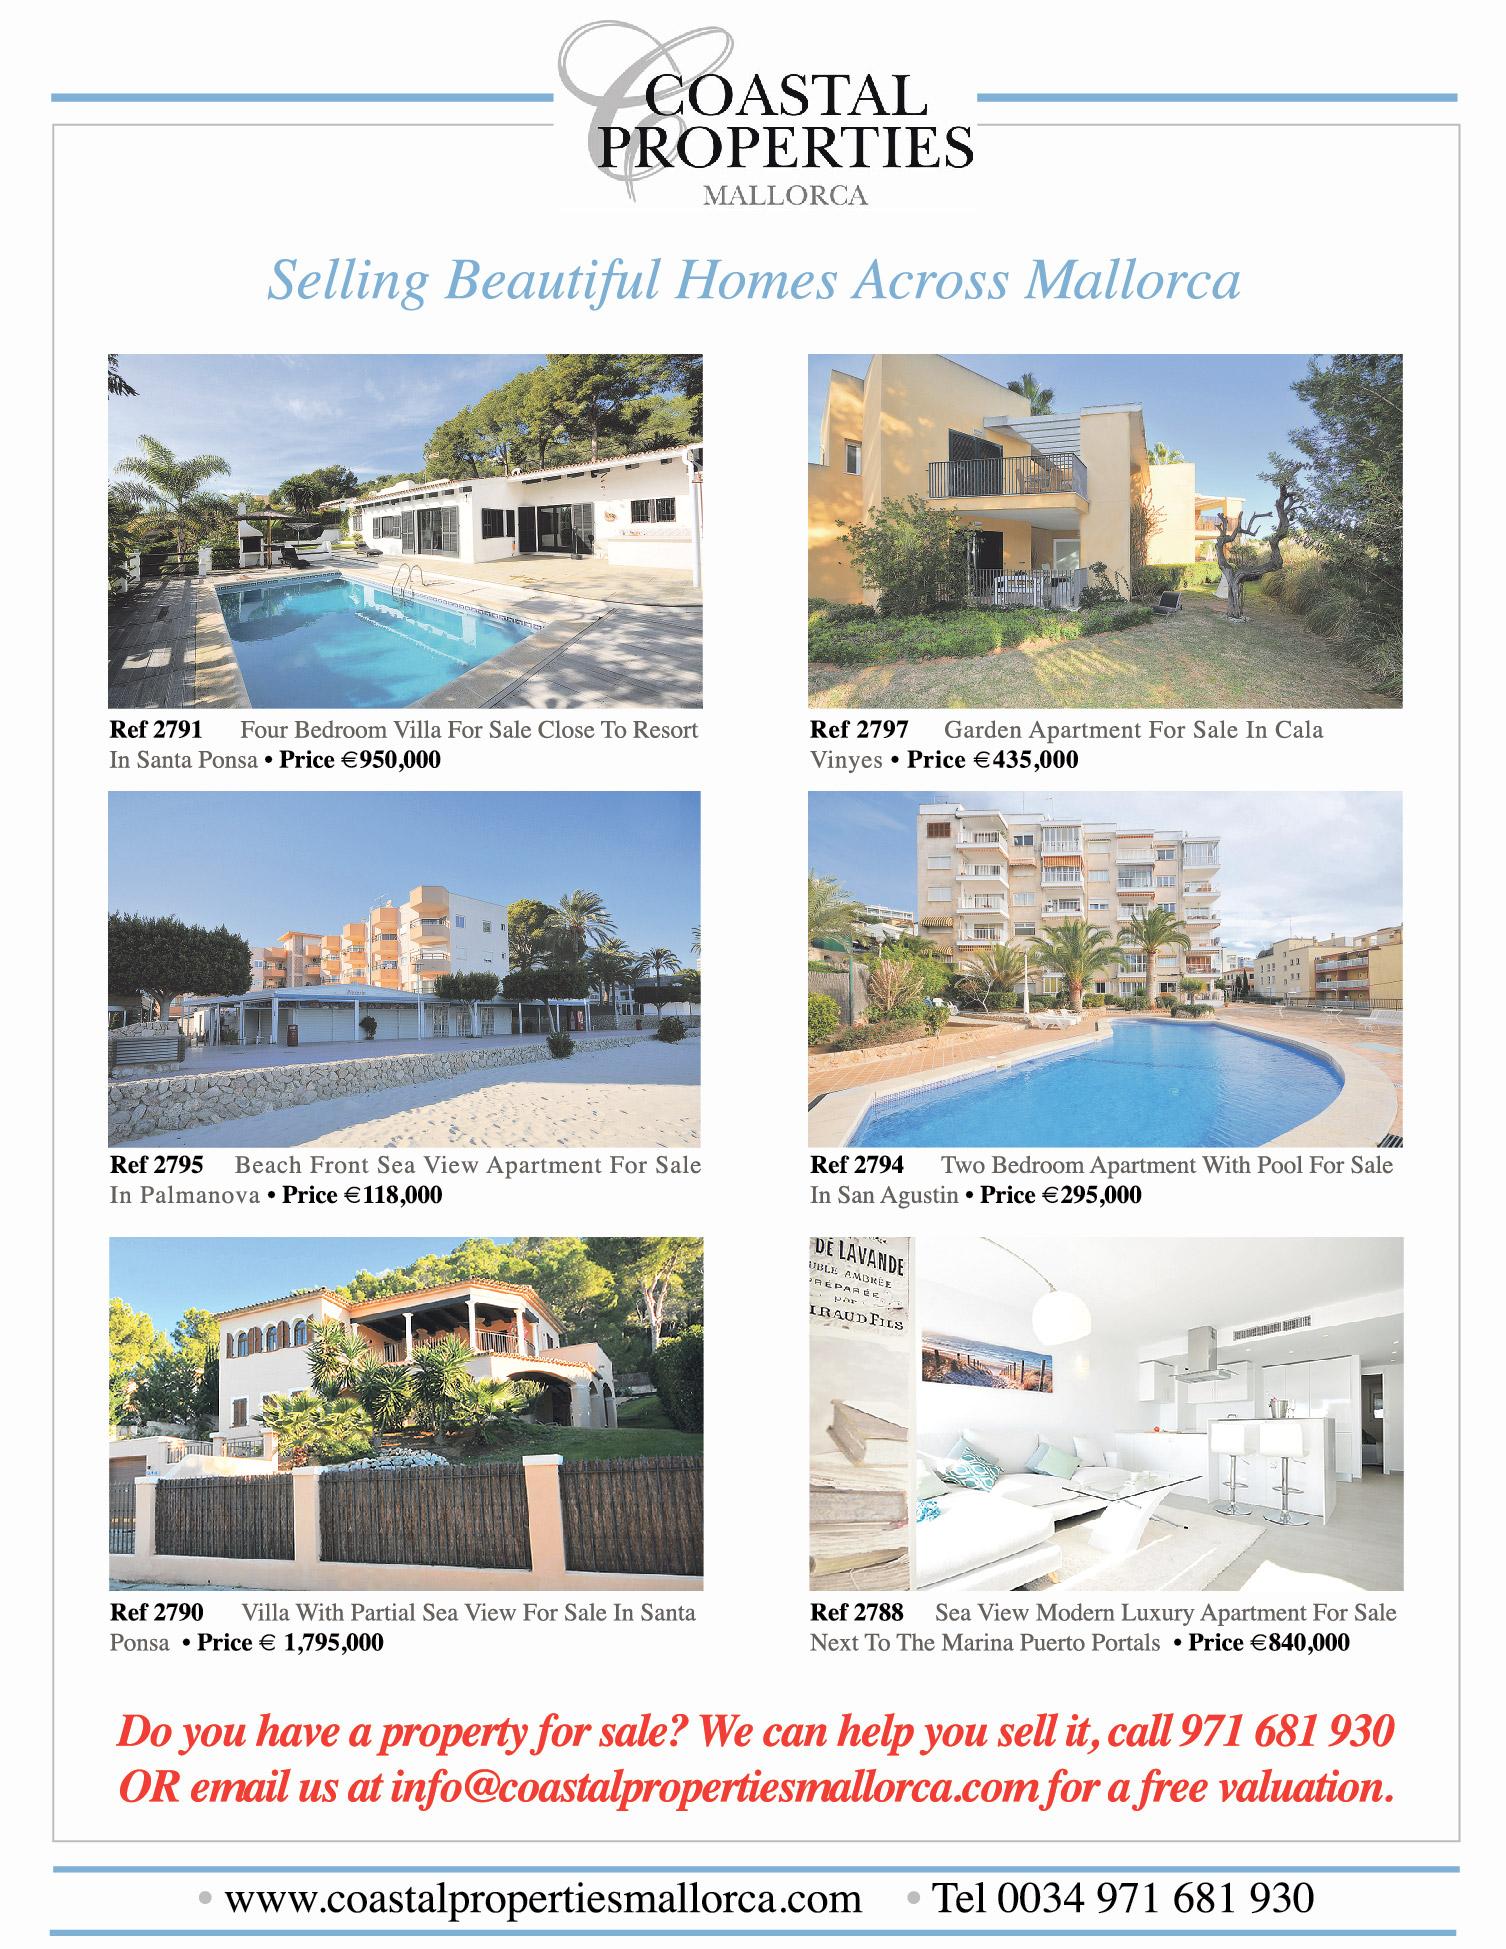 News paper adds Coastal Properties